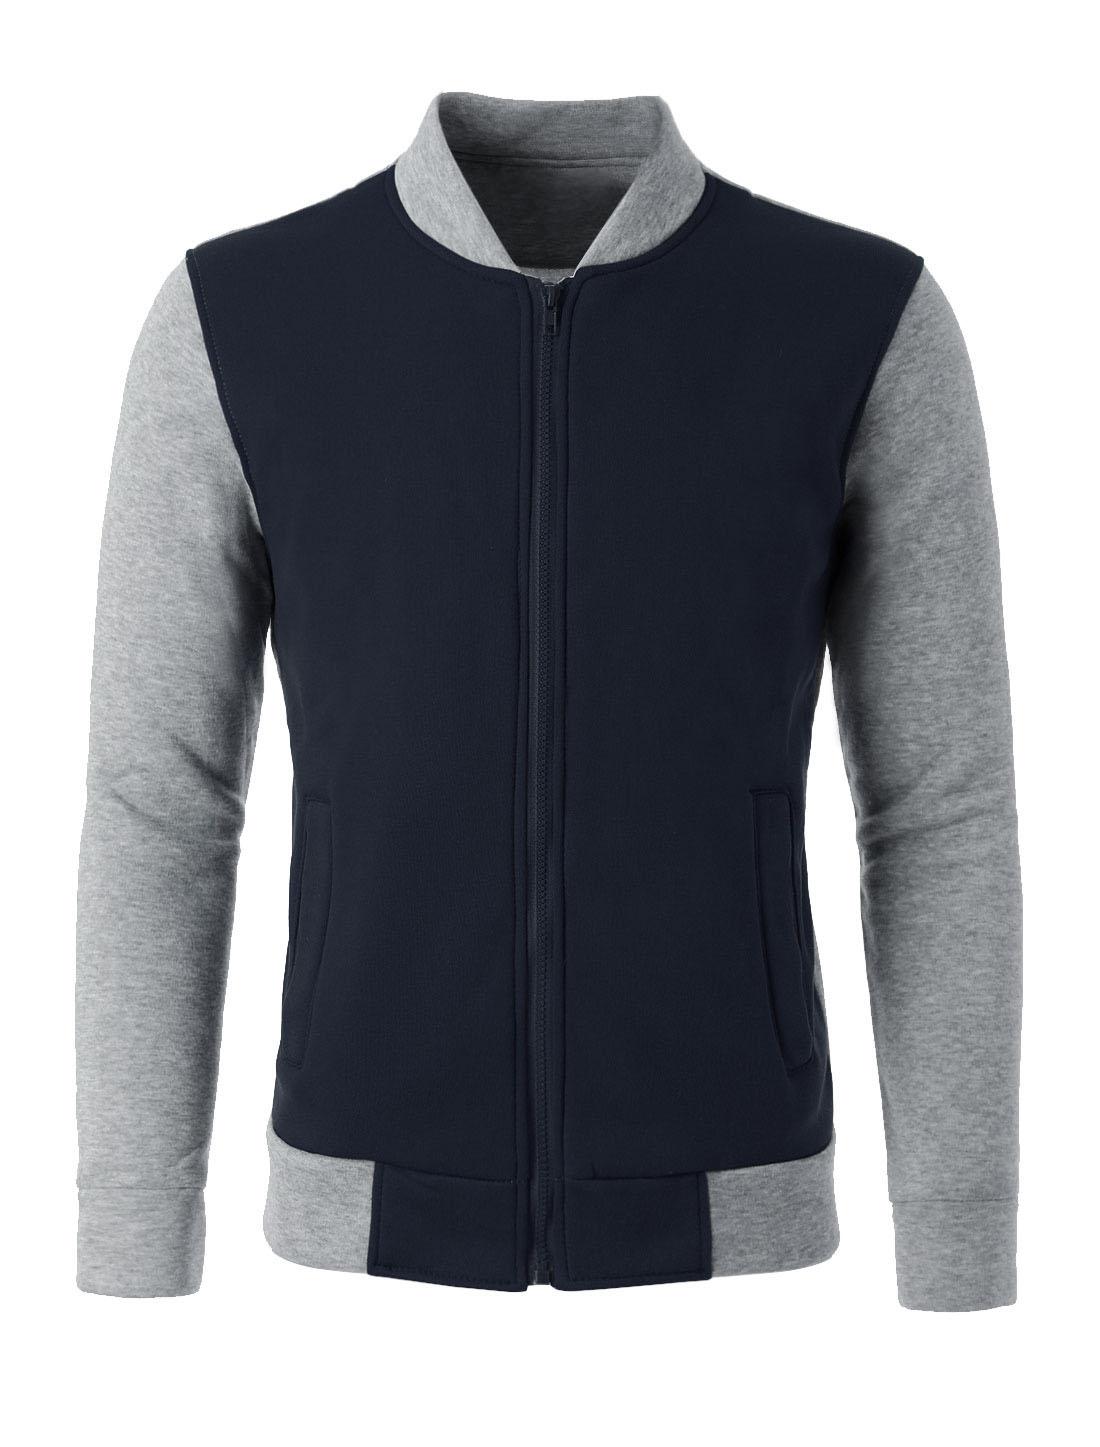 Men Color Block Lightweight Stand Collar Varsity Jacket Navy Blue Gray L